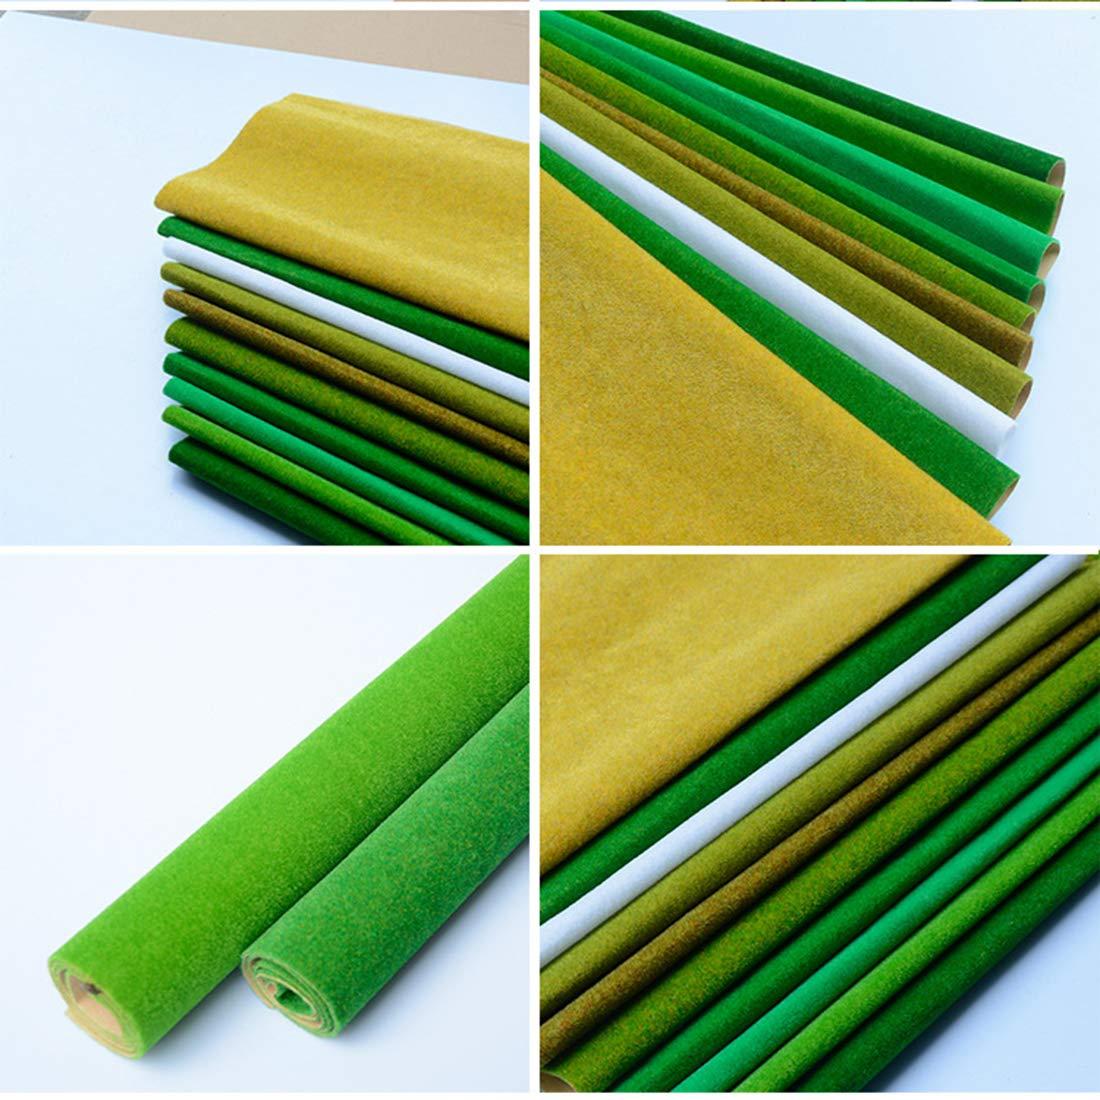 Amazon.com: WOLFBUSH Model Grass Mat, 4Pcs Artificial Turf ...